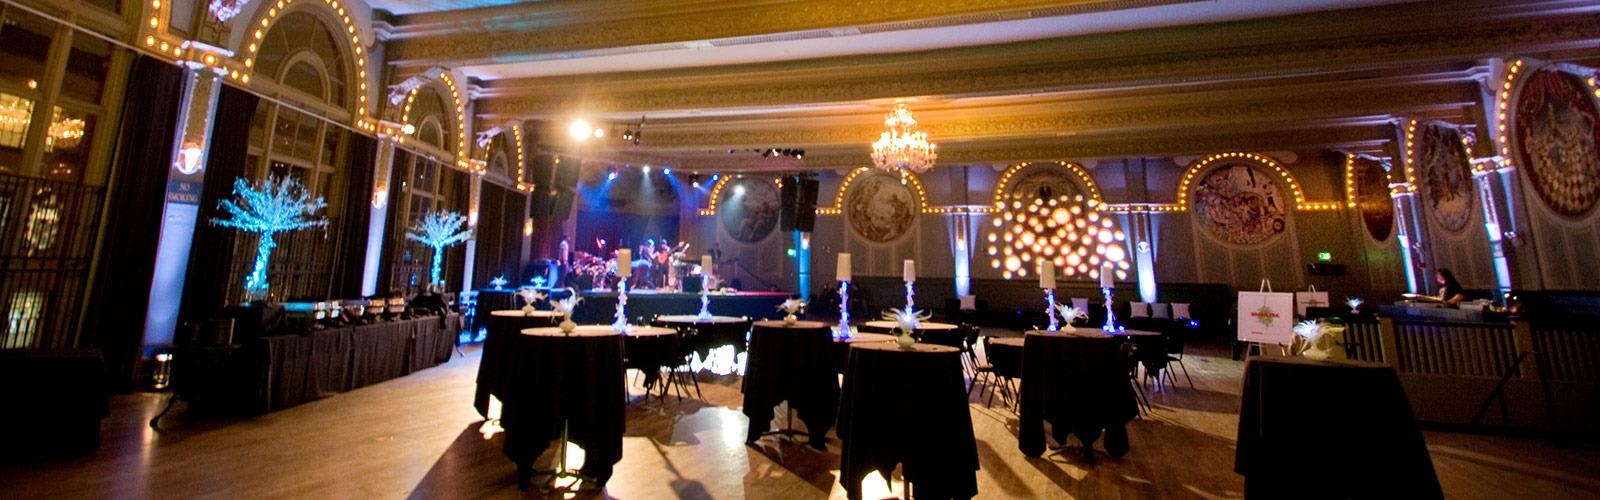 <h3 >Crystal Ballroom</h3>